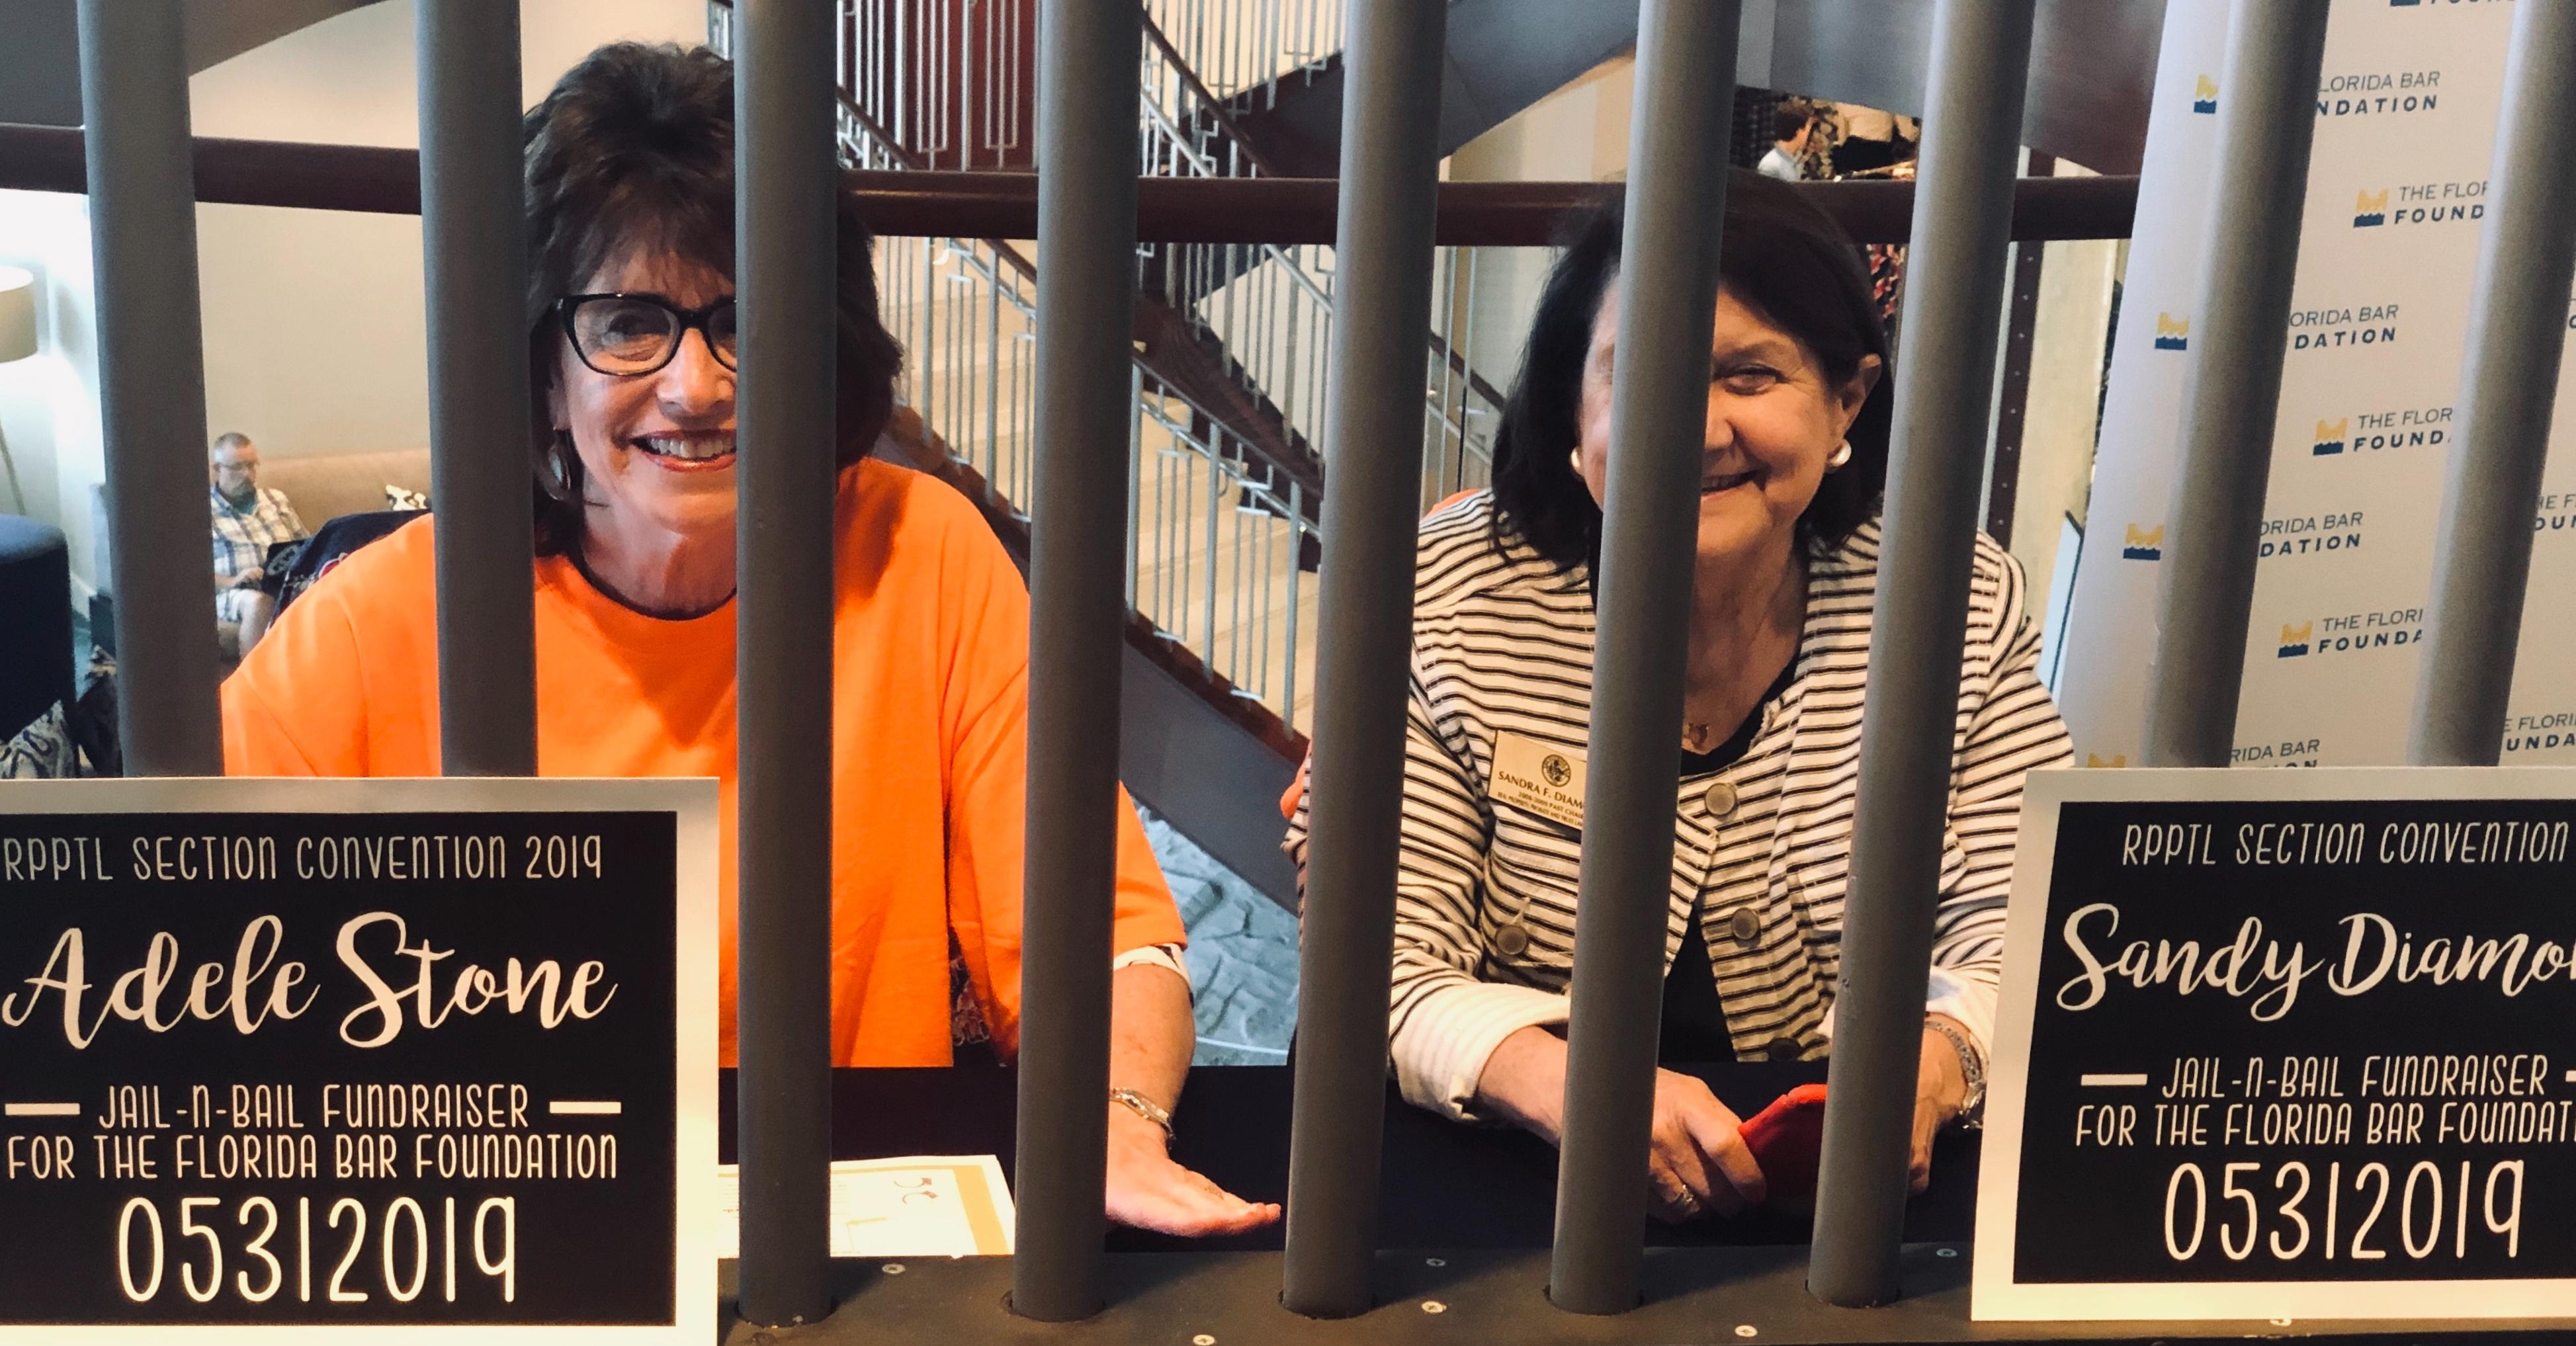 Jail-N-Bail Fundraiser